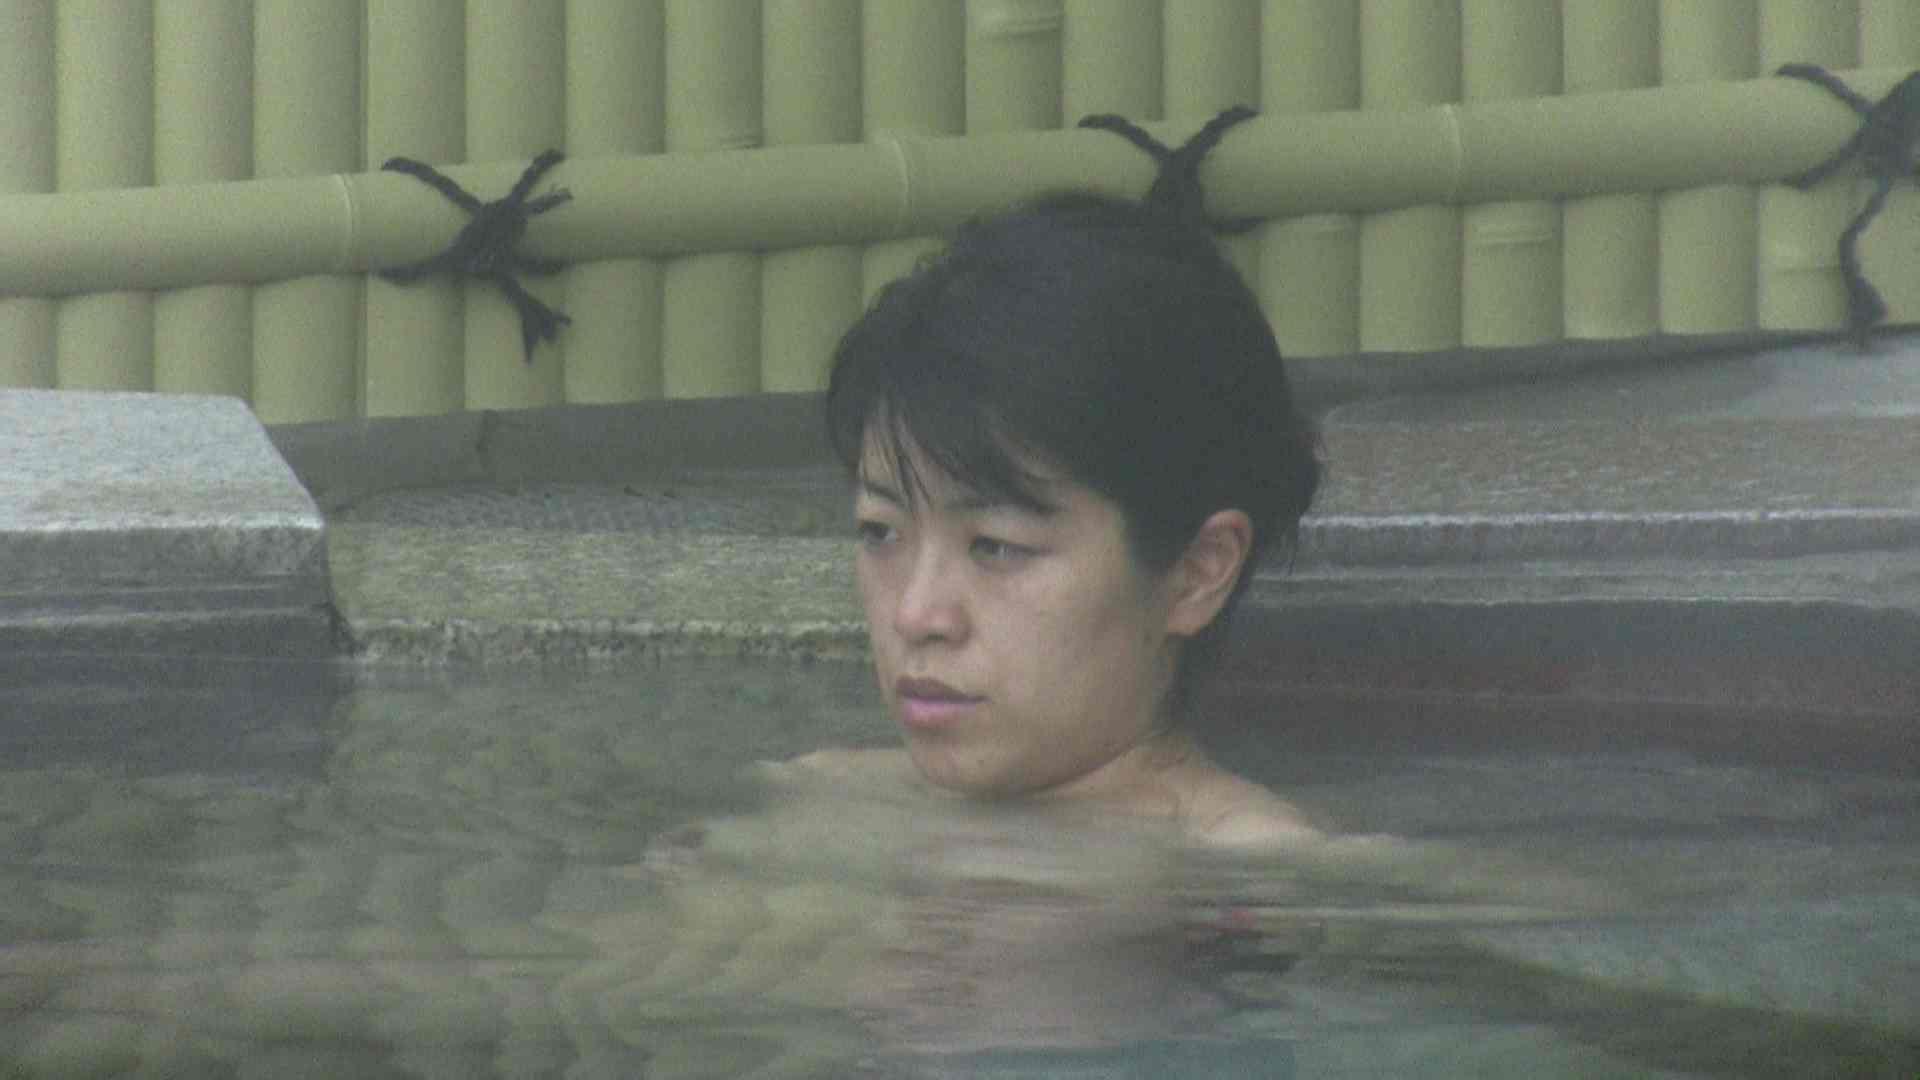 Aquaな露天風呂Vol.585 HなOL | 盗撮  93pic 79